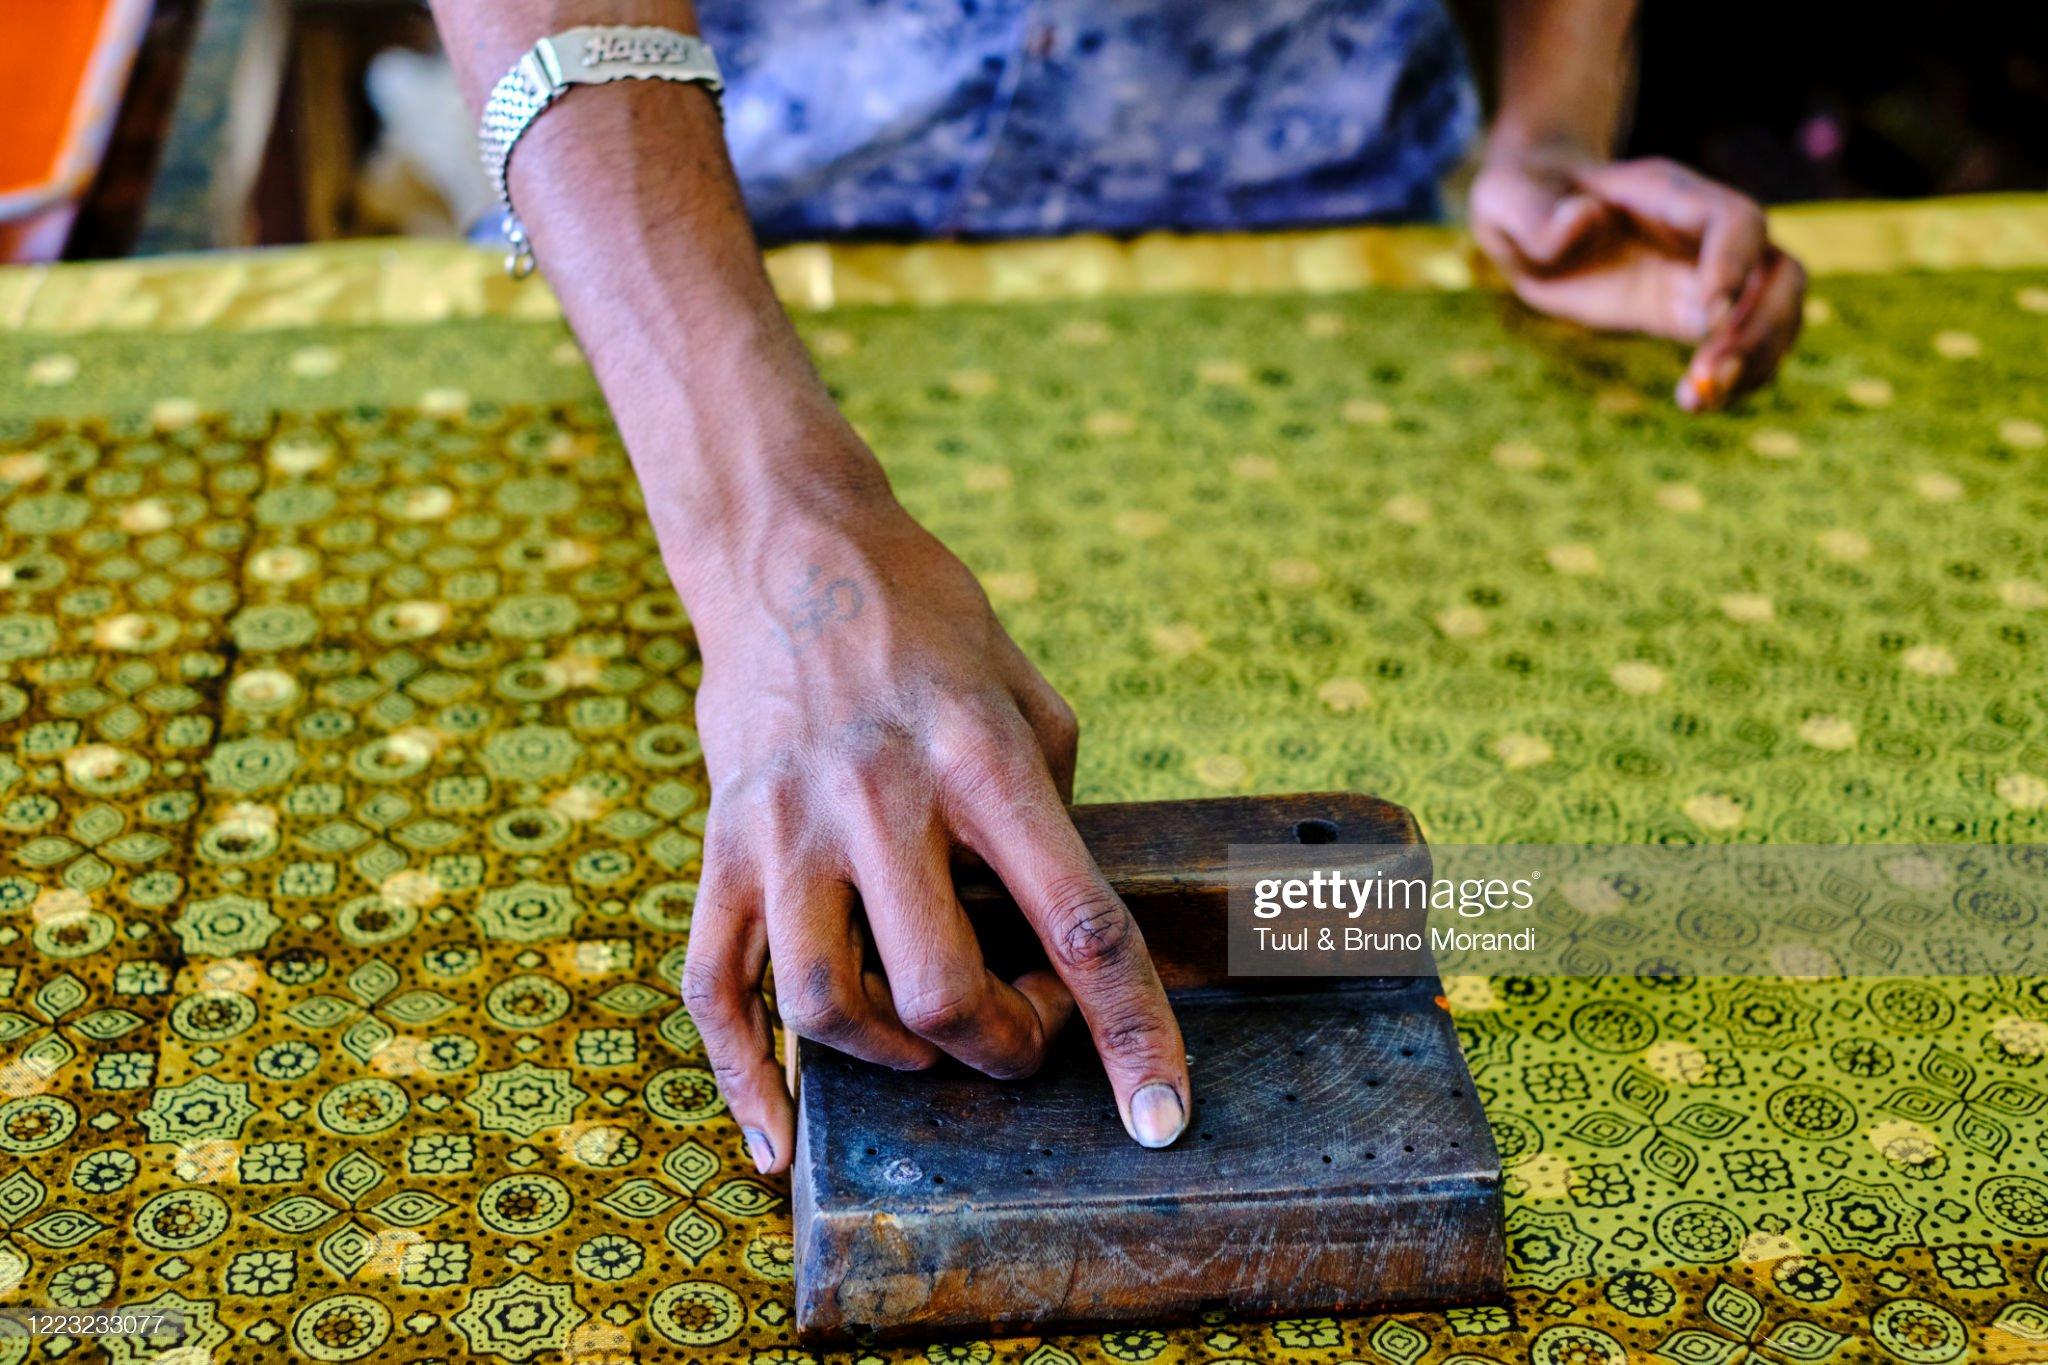 India, Gujarat, Kutch, Bhuj, Ajrakhpur, Ajrak block printing textile : Stock Photo